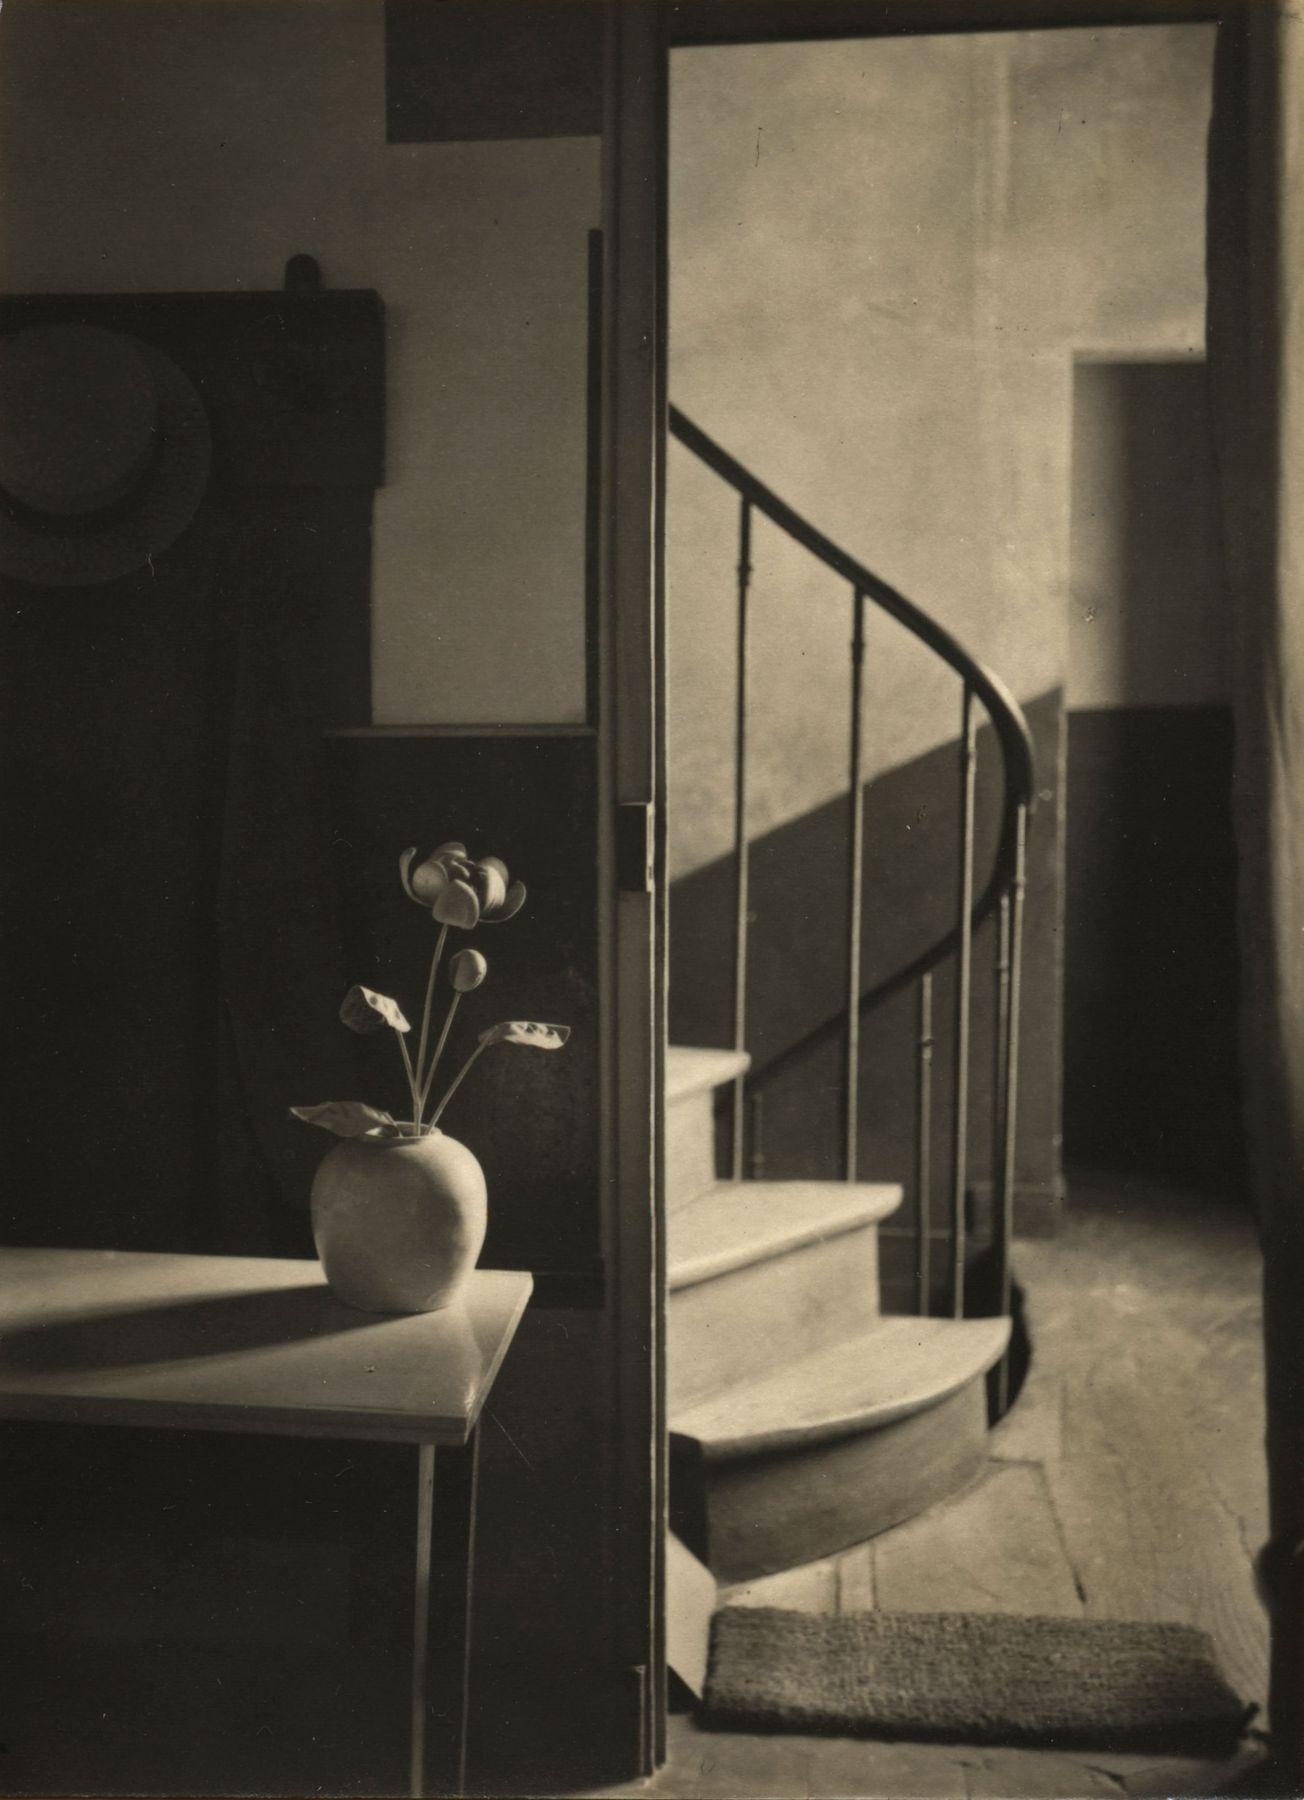 andré Kertész chez mondrian